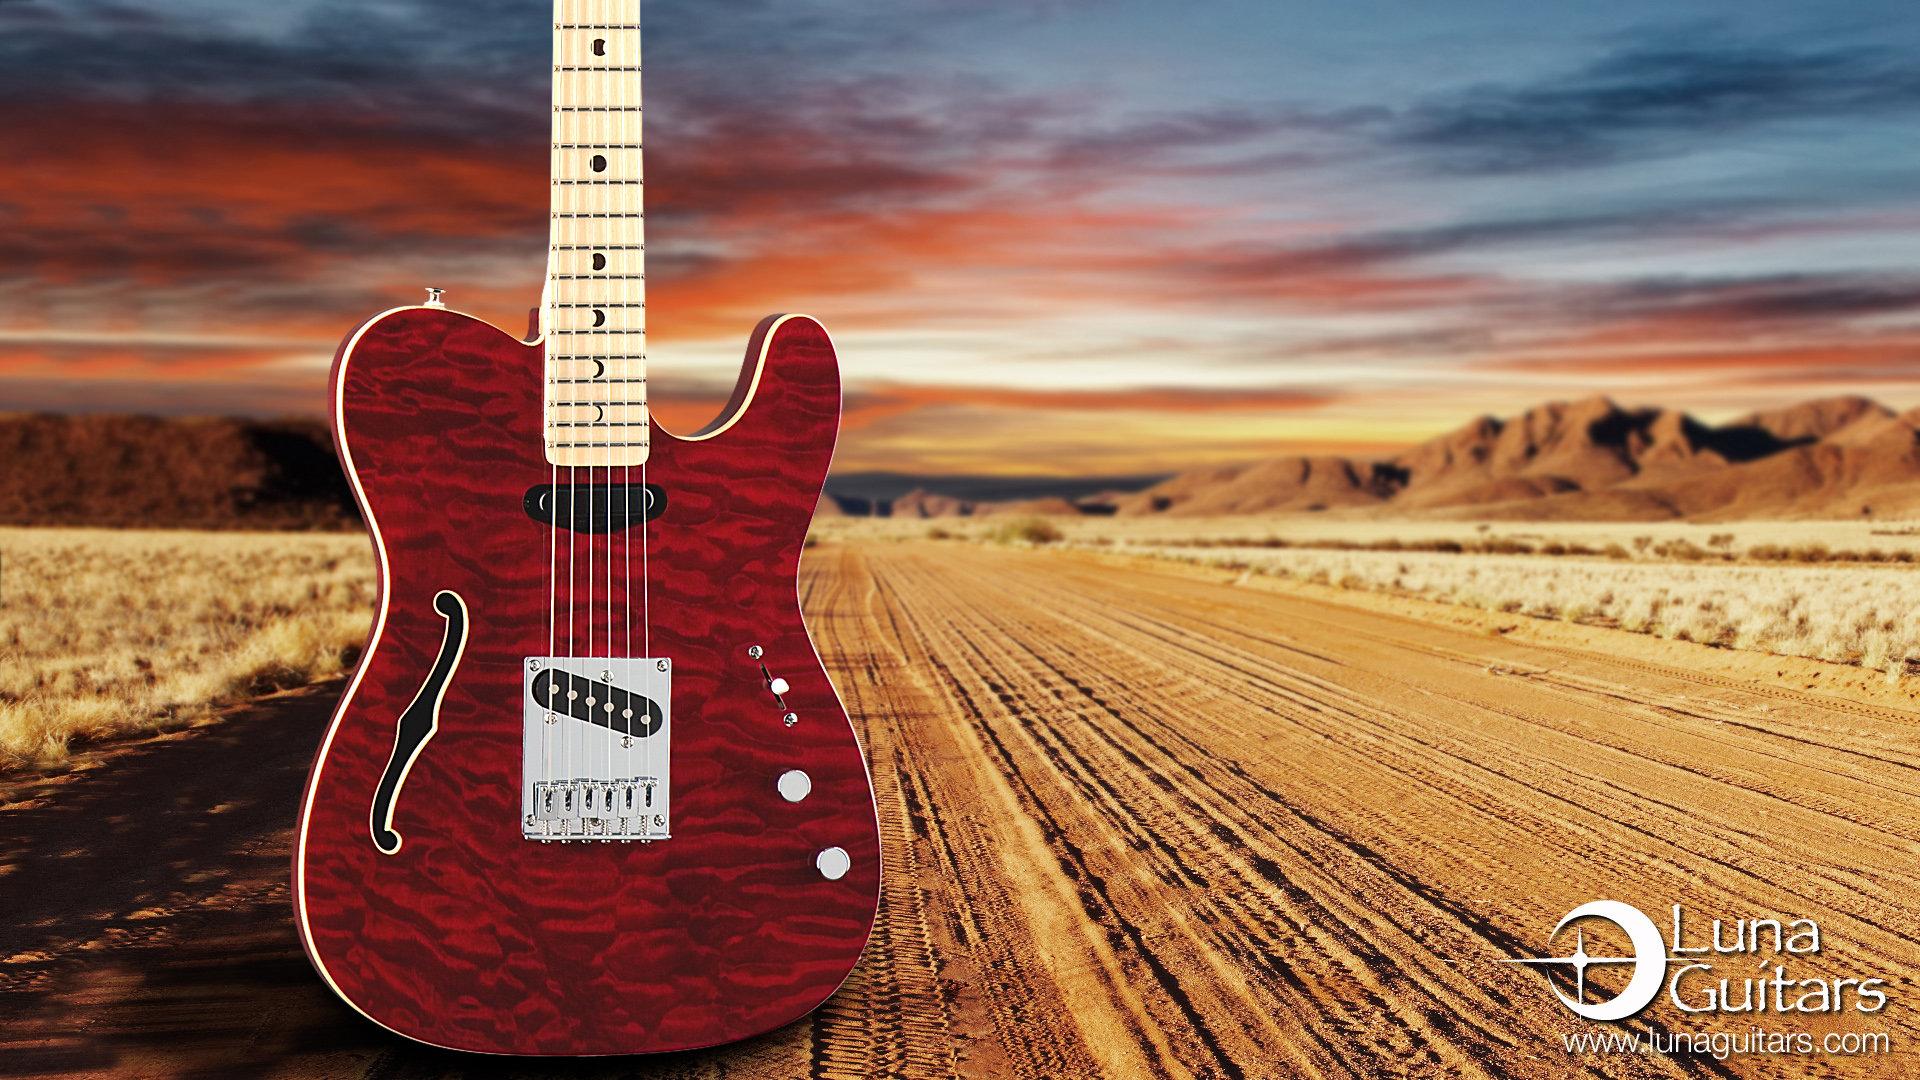 High Resolution Guitar Full Hd 1080p Background Id 249350 For Desktop